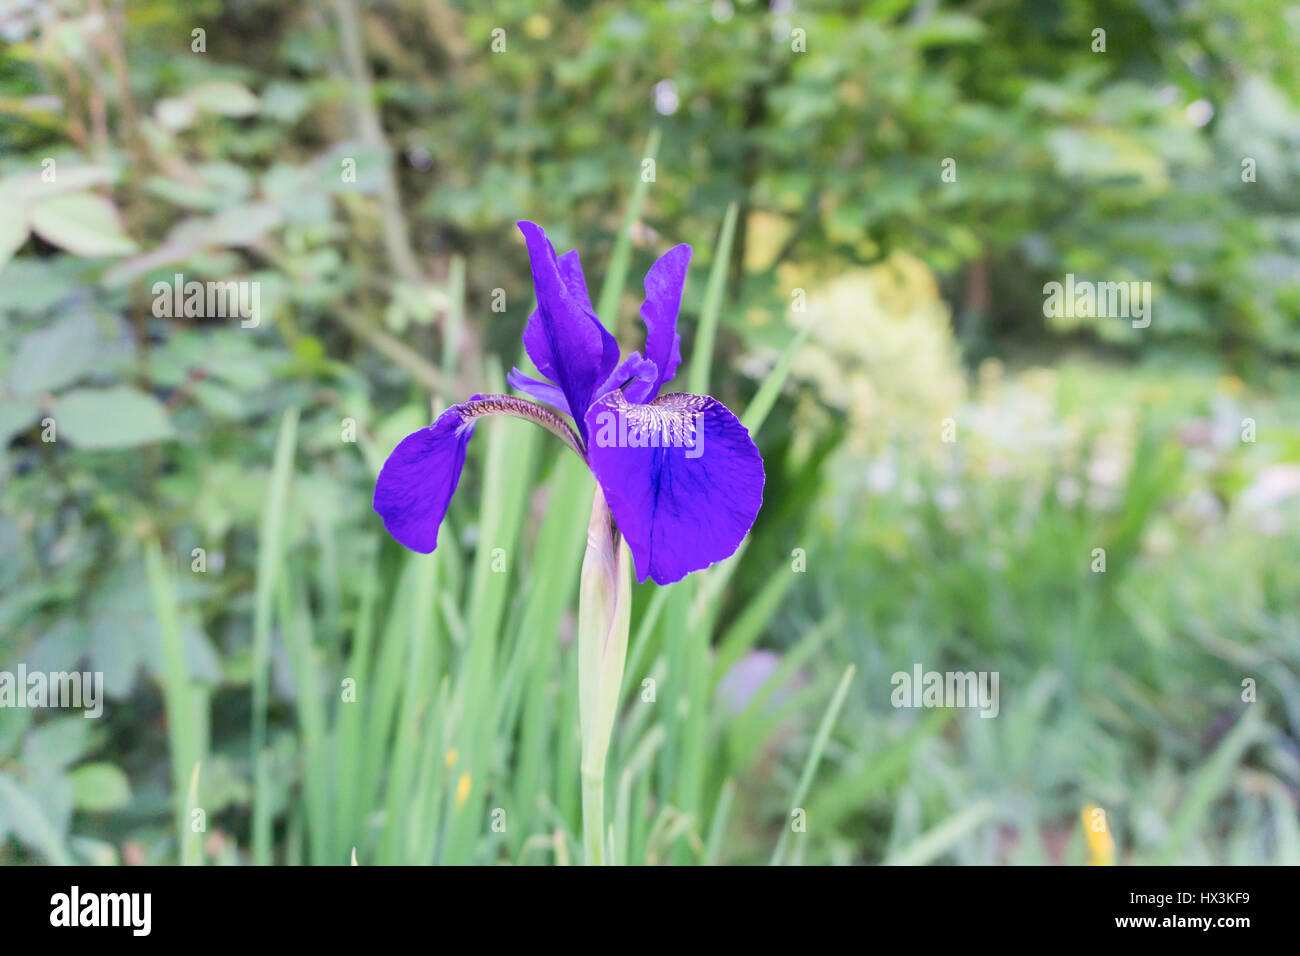 Purple lily flowers stock photo 136534813 alamy purple lily flowers izmirmasajfo Gallery